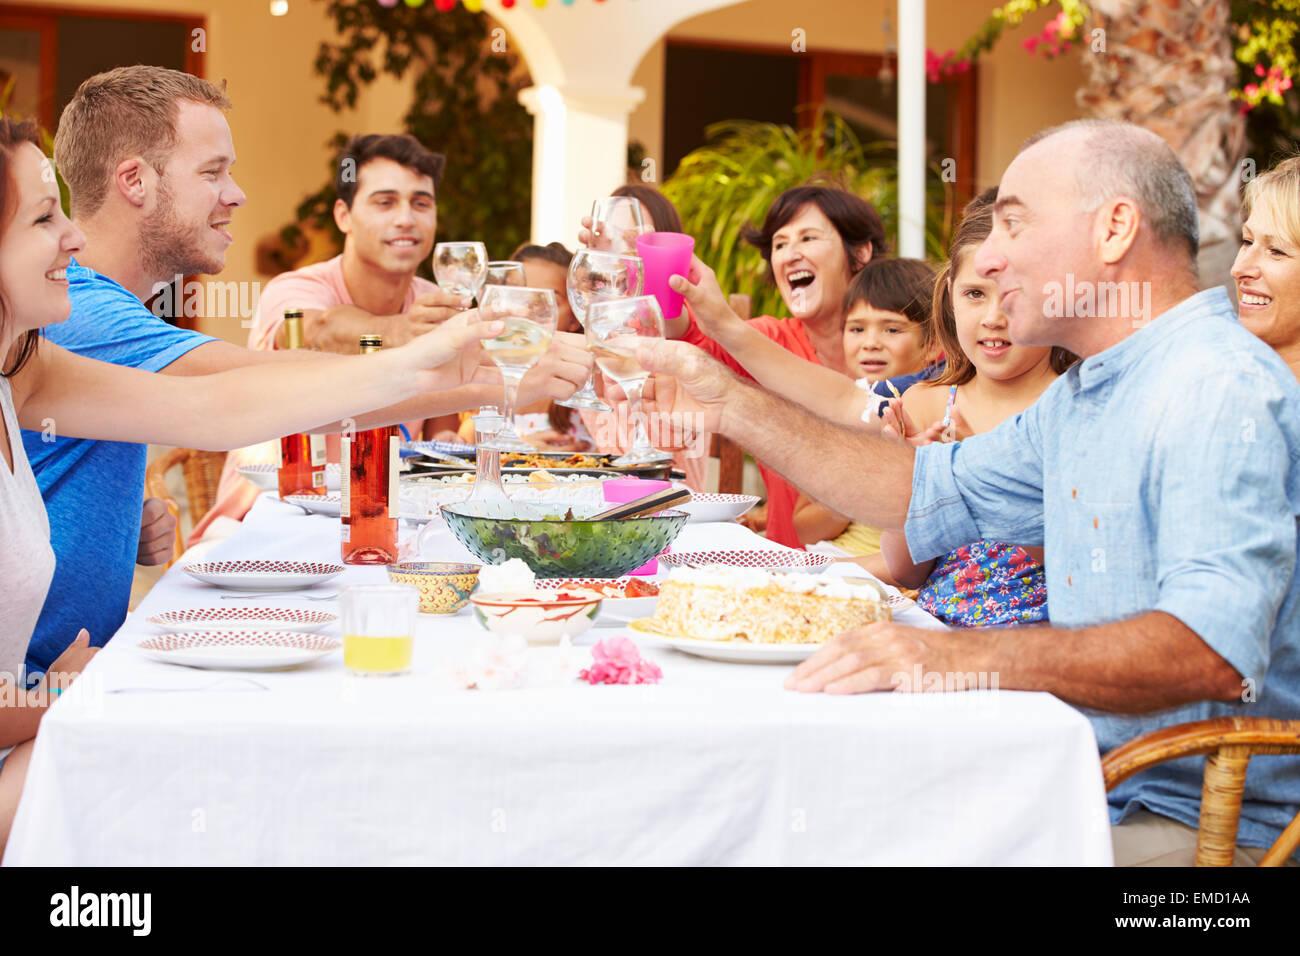 Large Family Group Celebrating Birthday On Terrace Together - Stock Image